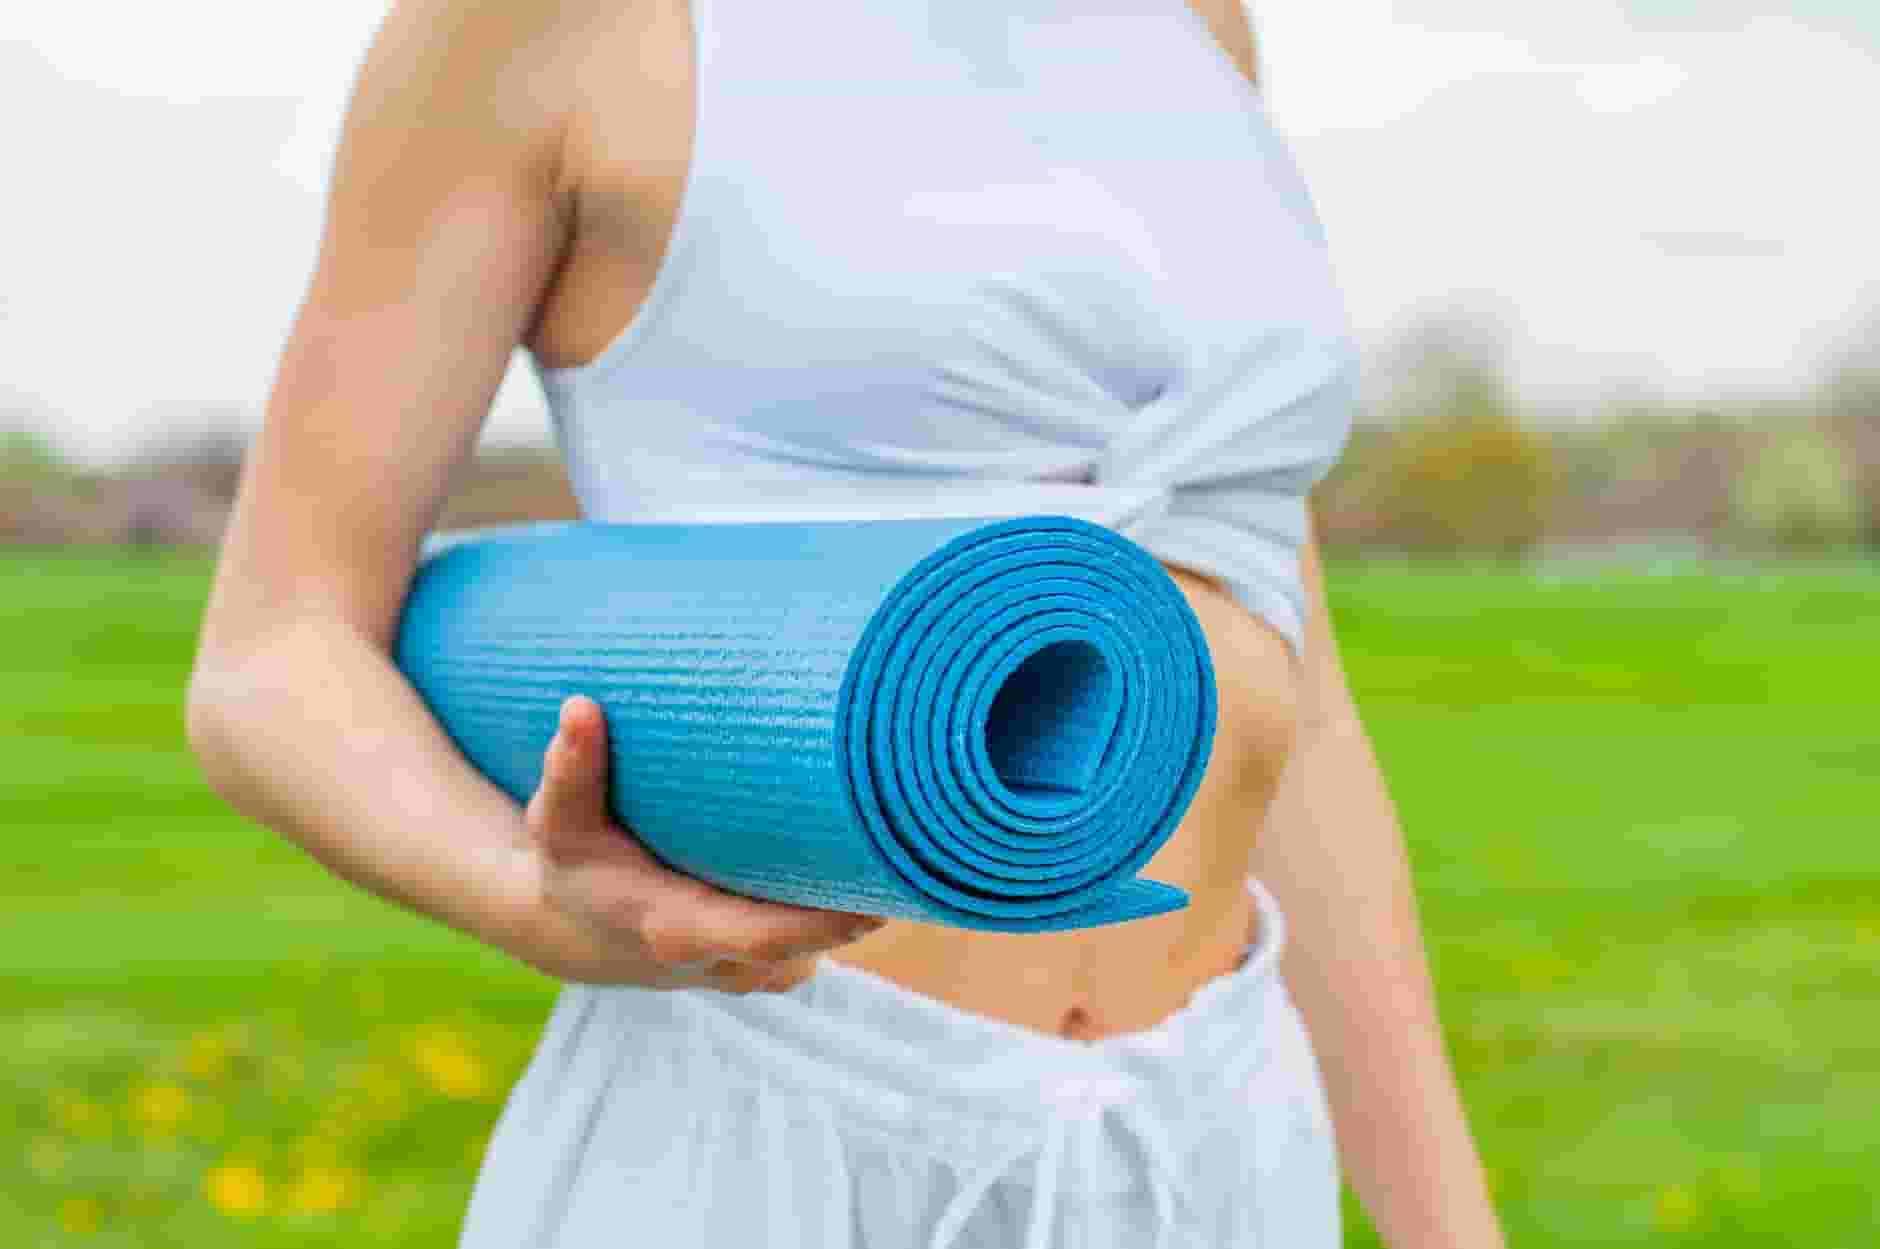 बवासीर के लिए योग – Bawasir Ke Liye Yoga (Yoga for Piles in Hindi)